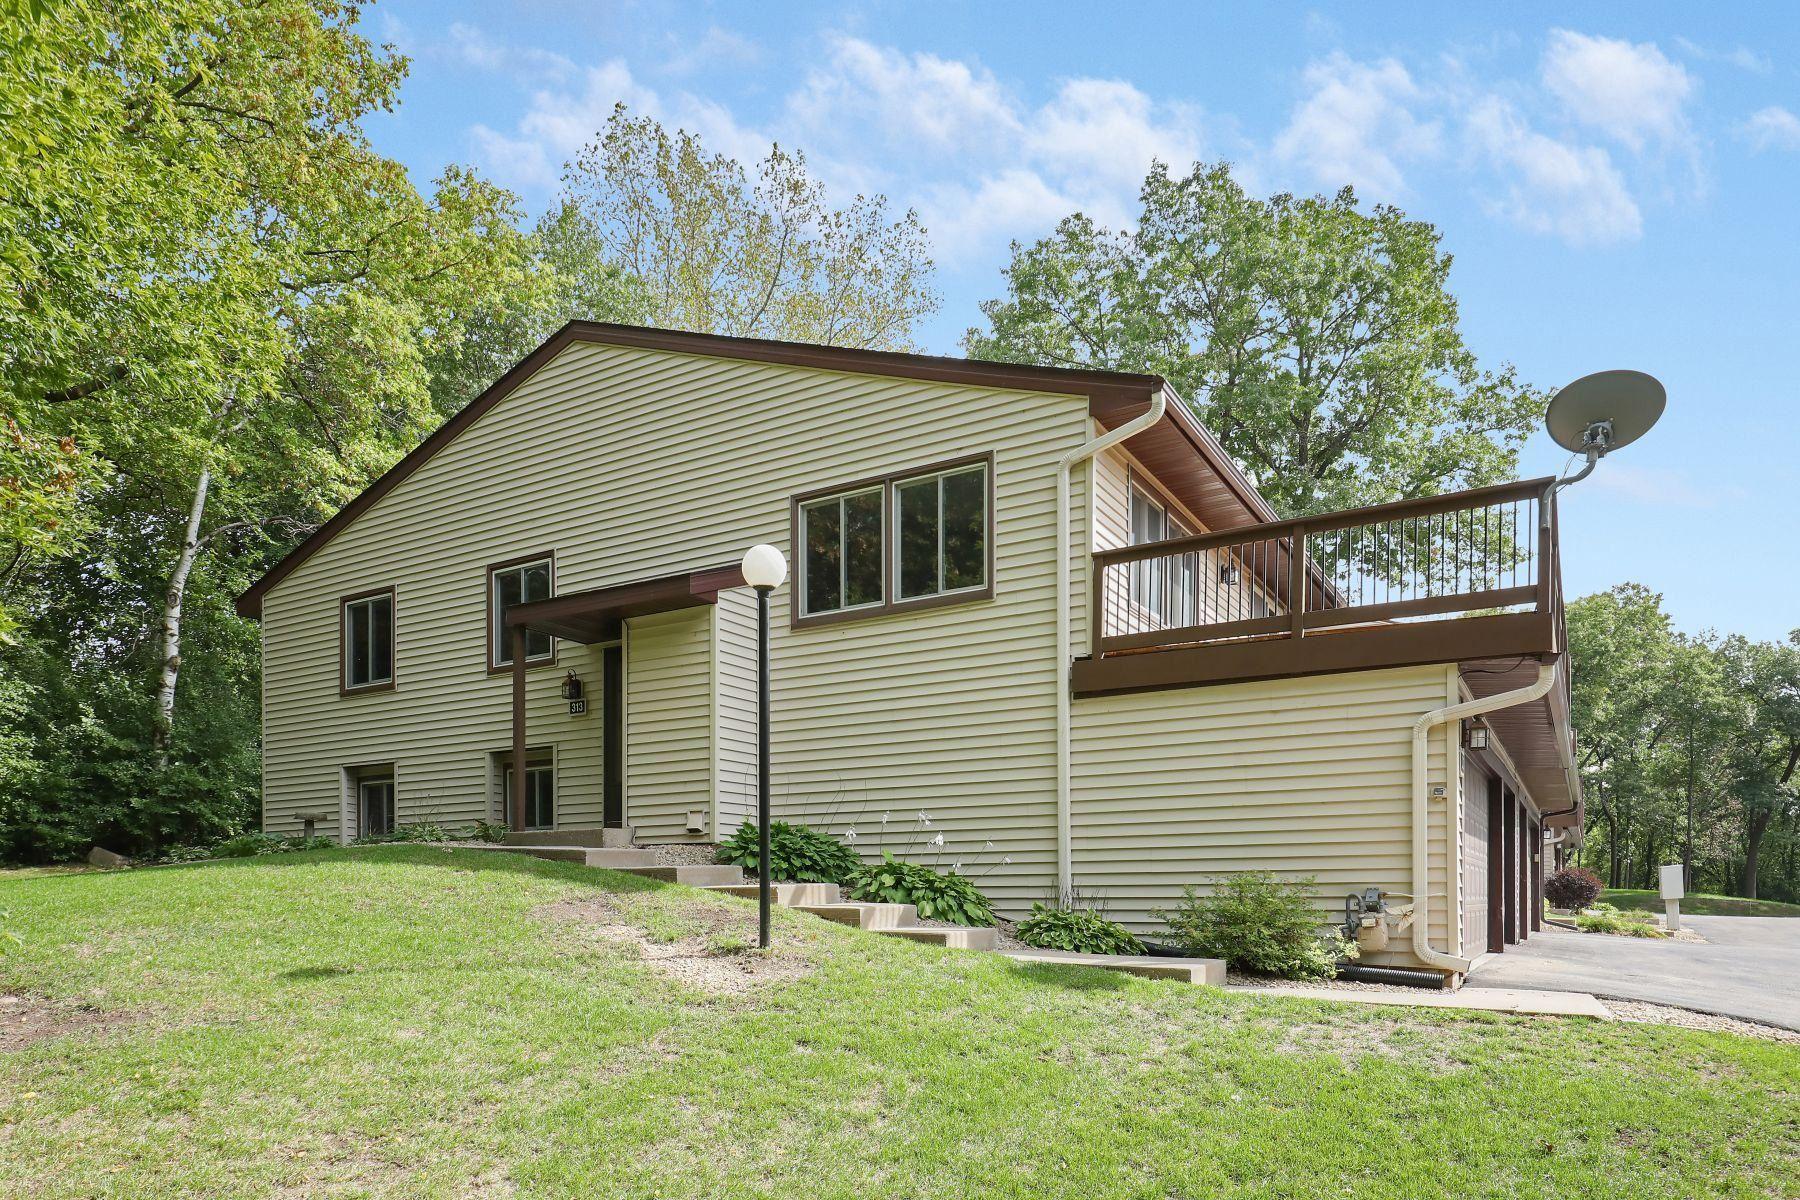 Photo of 313 River Woods Lane, Burnsville, MN 55337 (MLS # 6095155)